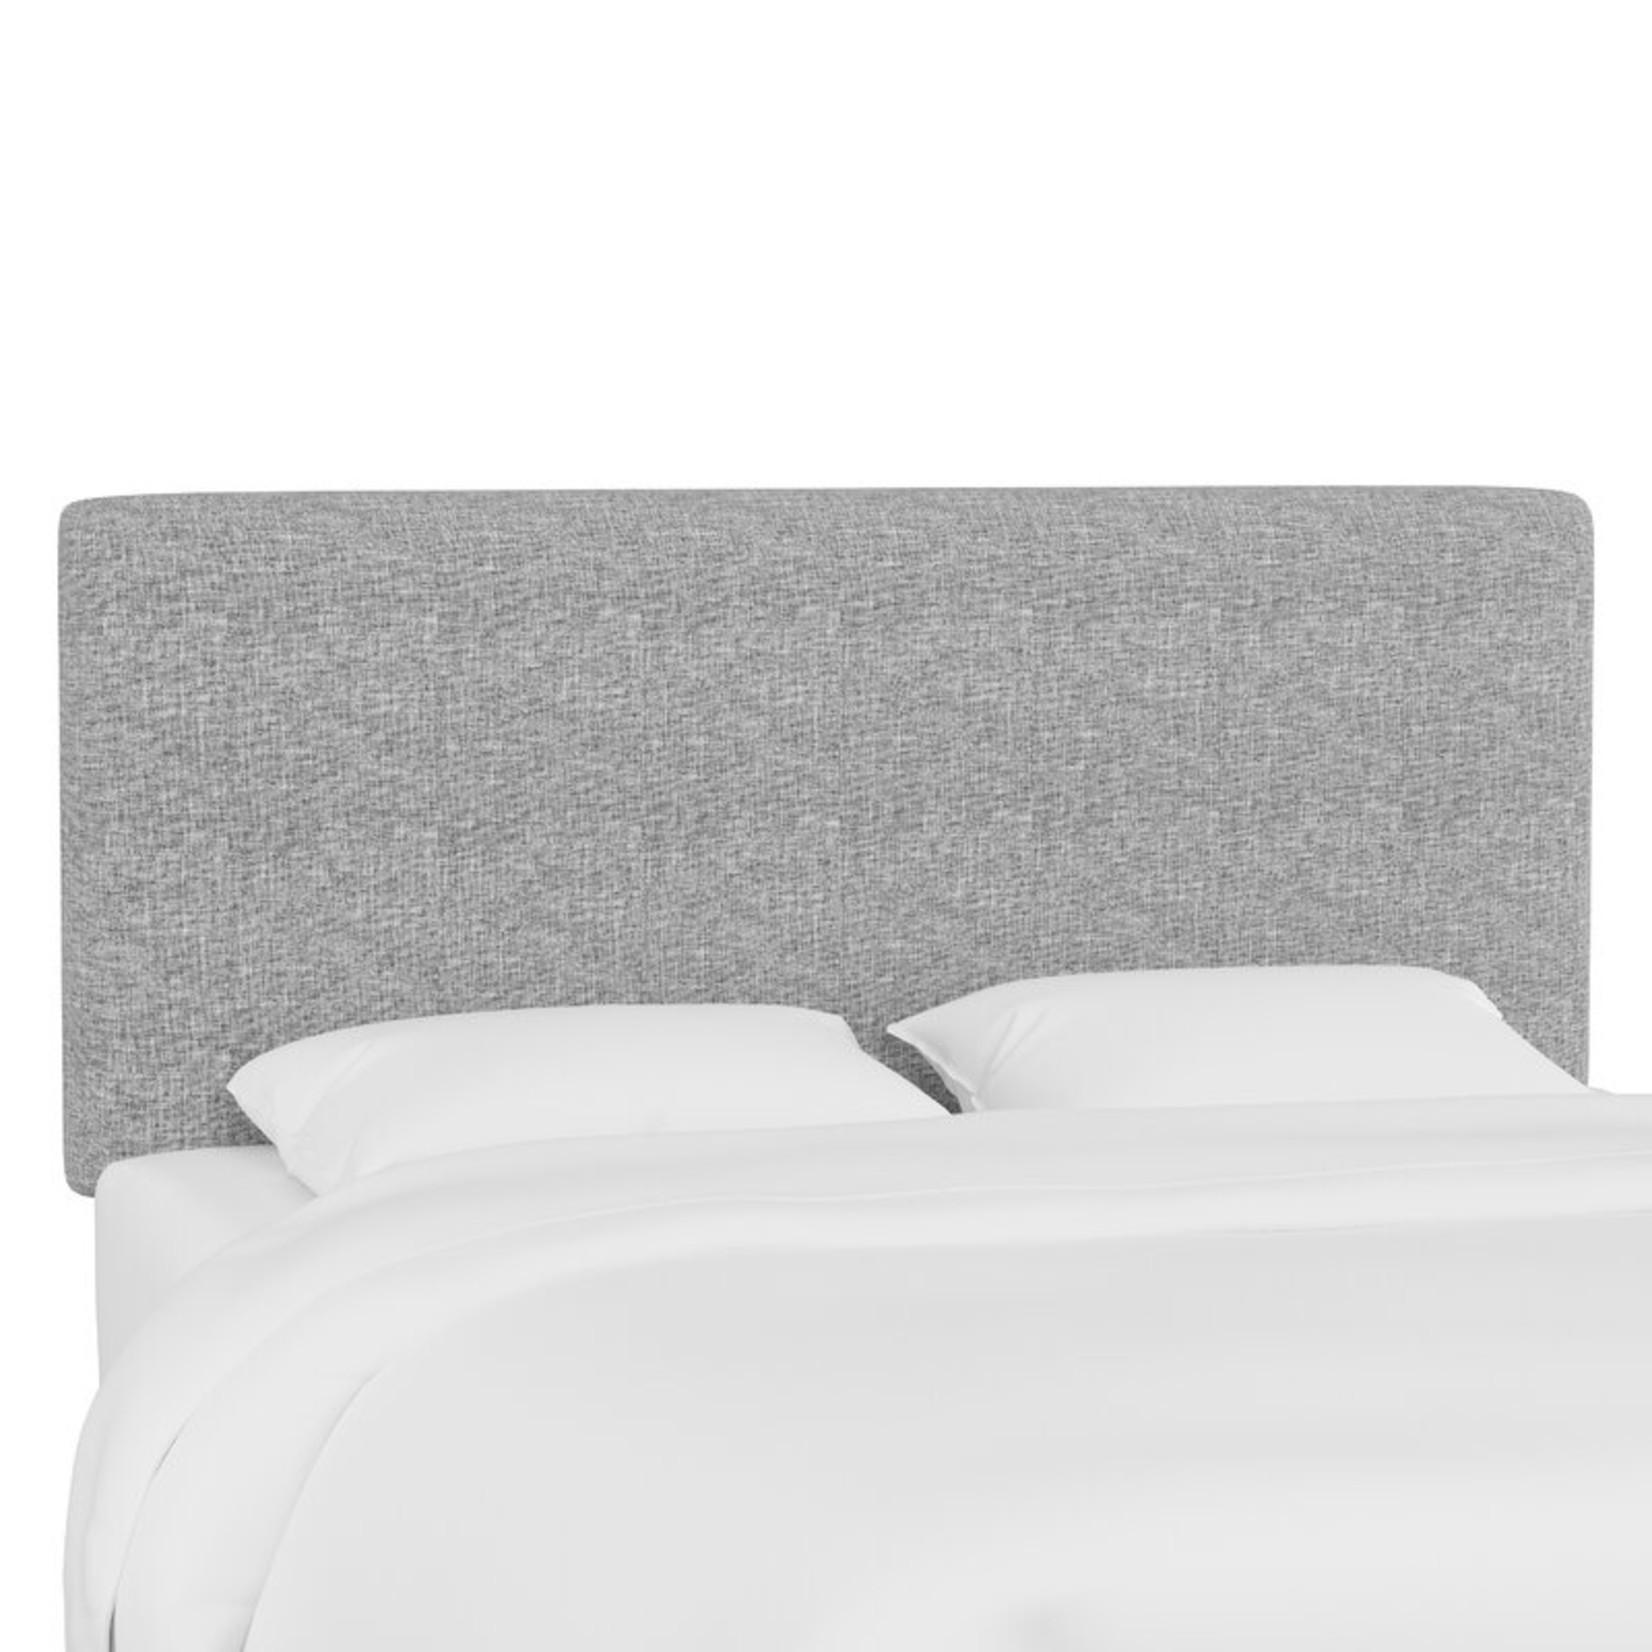 *King - Berkshire Upholstered Panel Headboard - Pumice